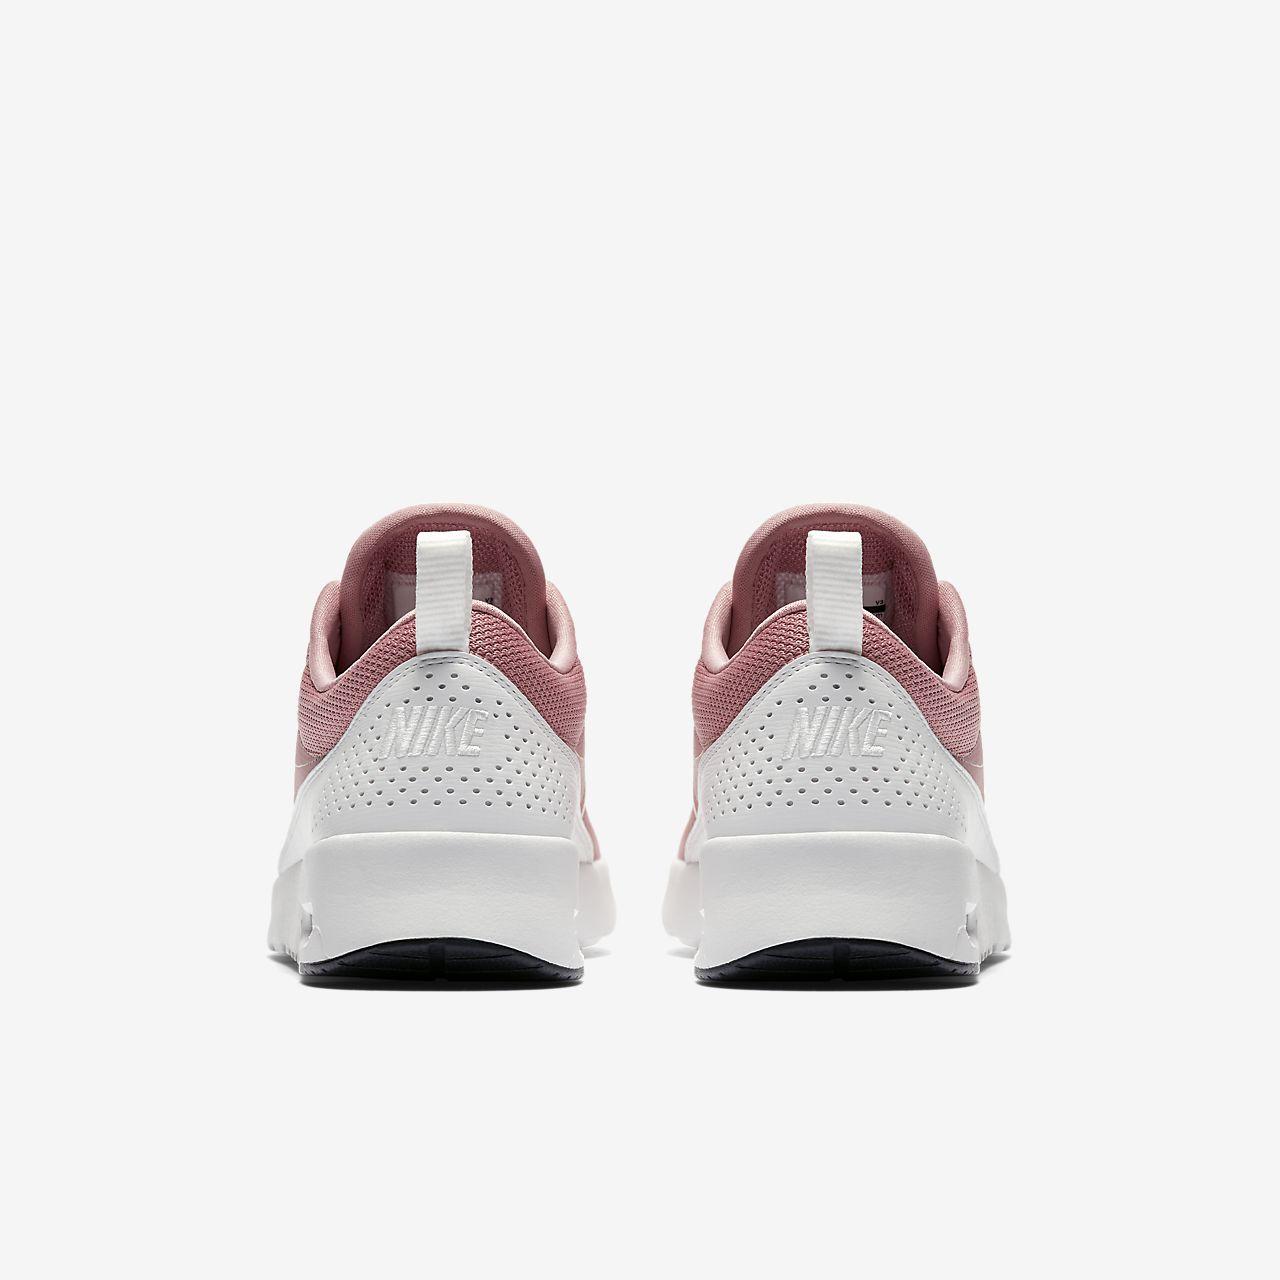 scarpa nike air max thea rust pinksummit whitenerorust